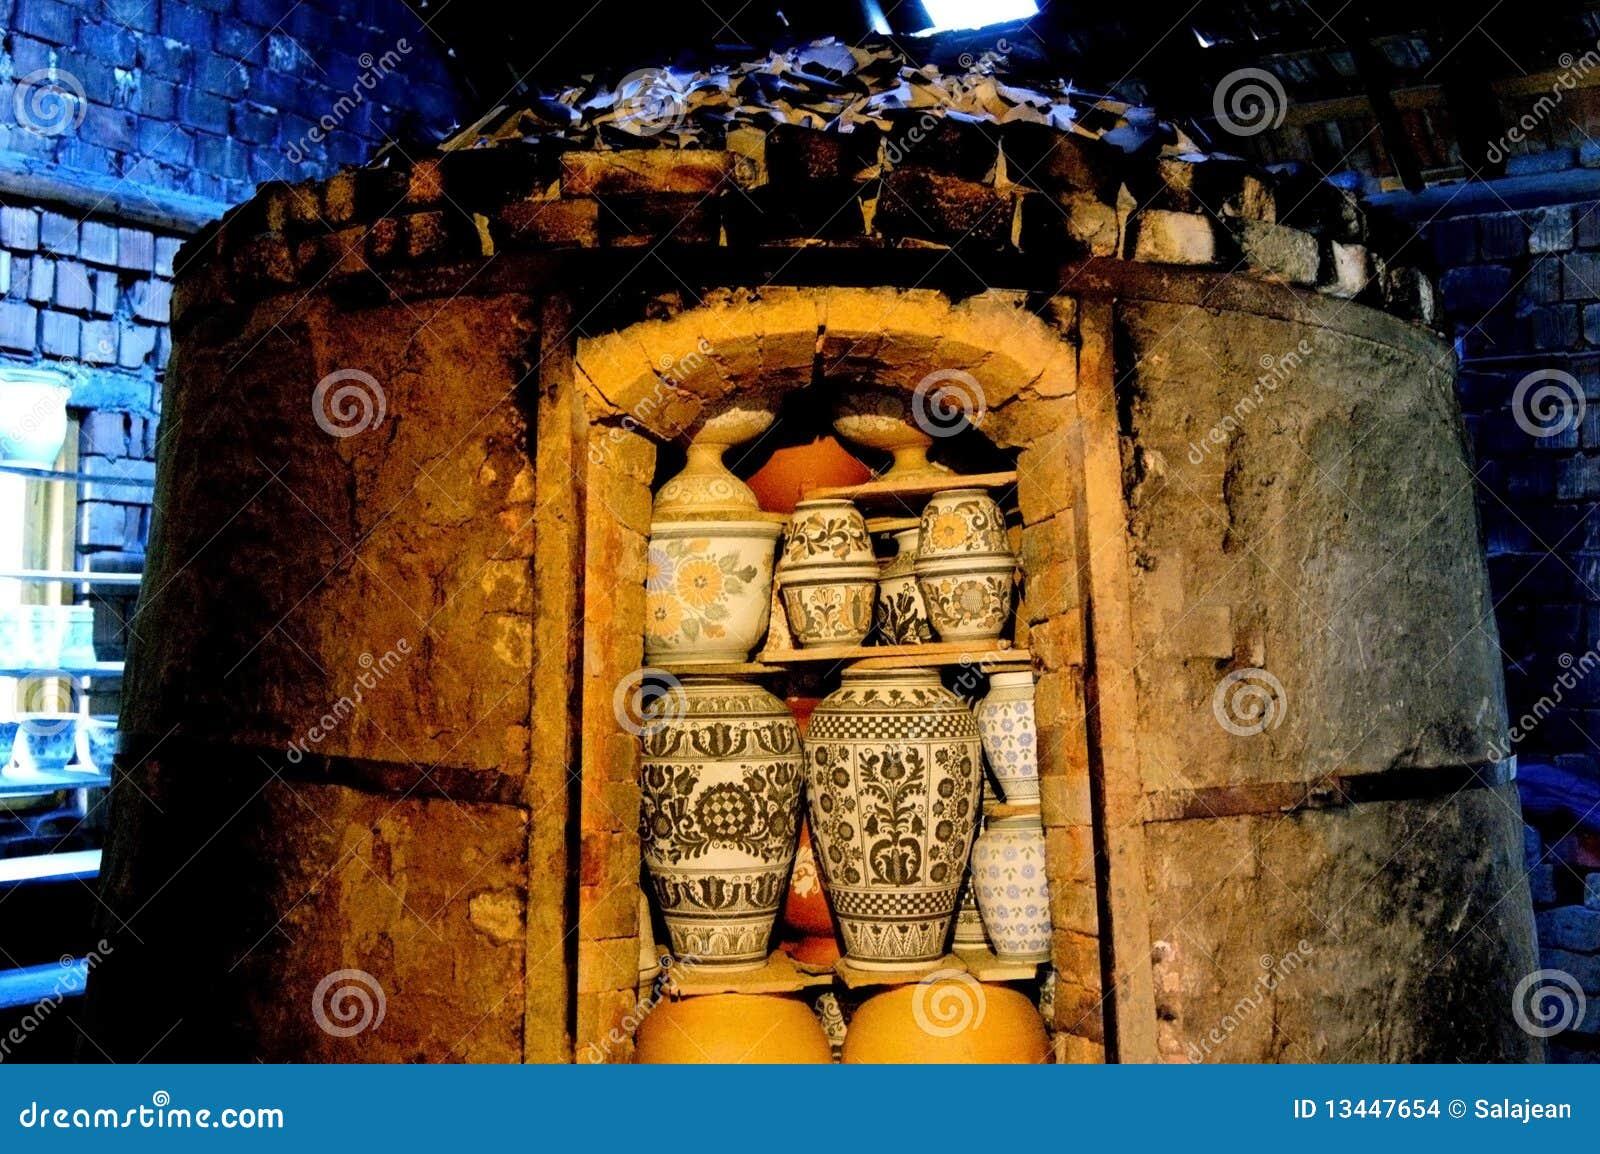 Horno, horno para quemar, cerámica de la asación